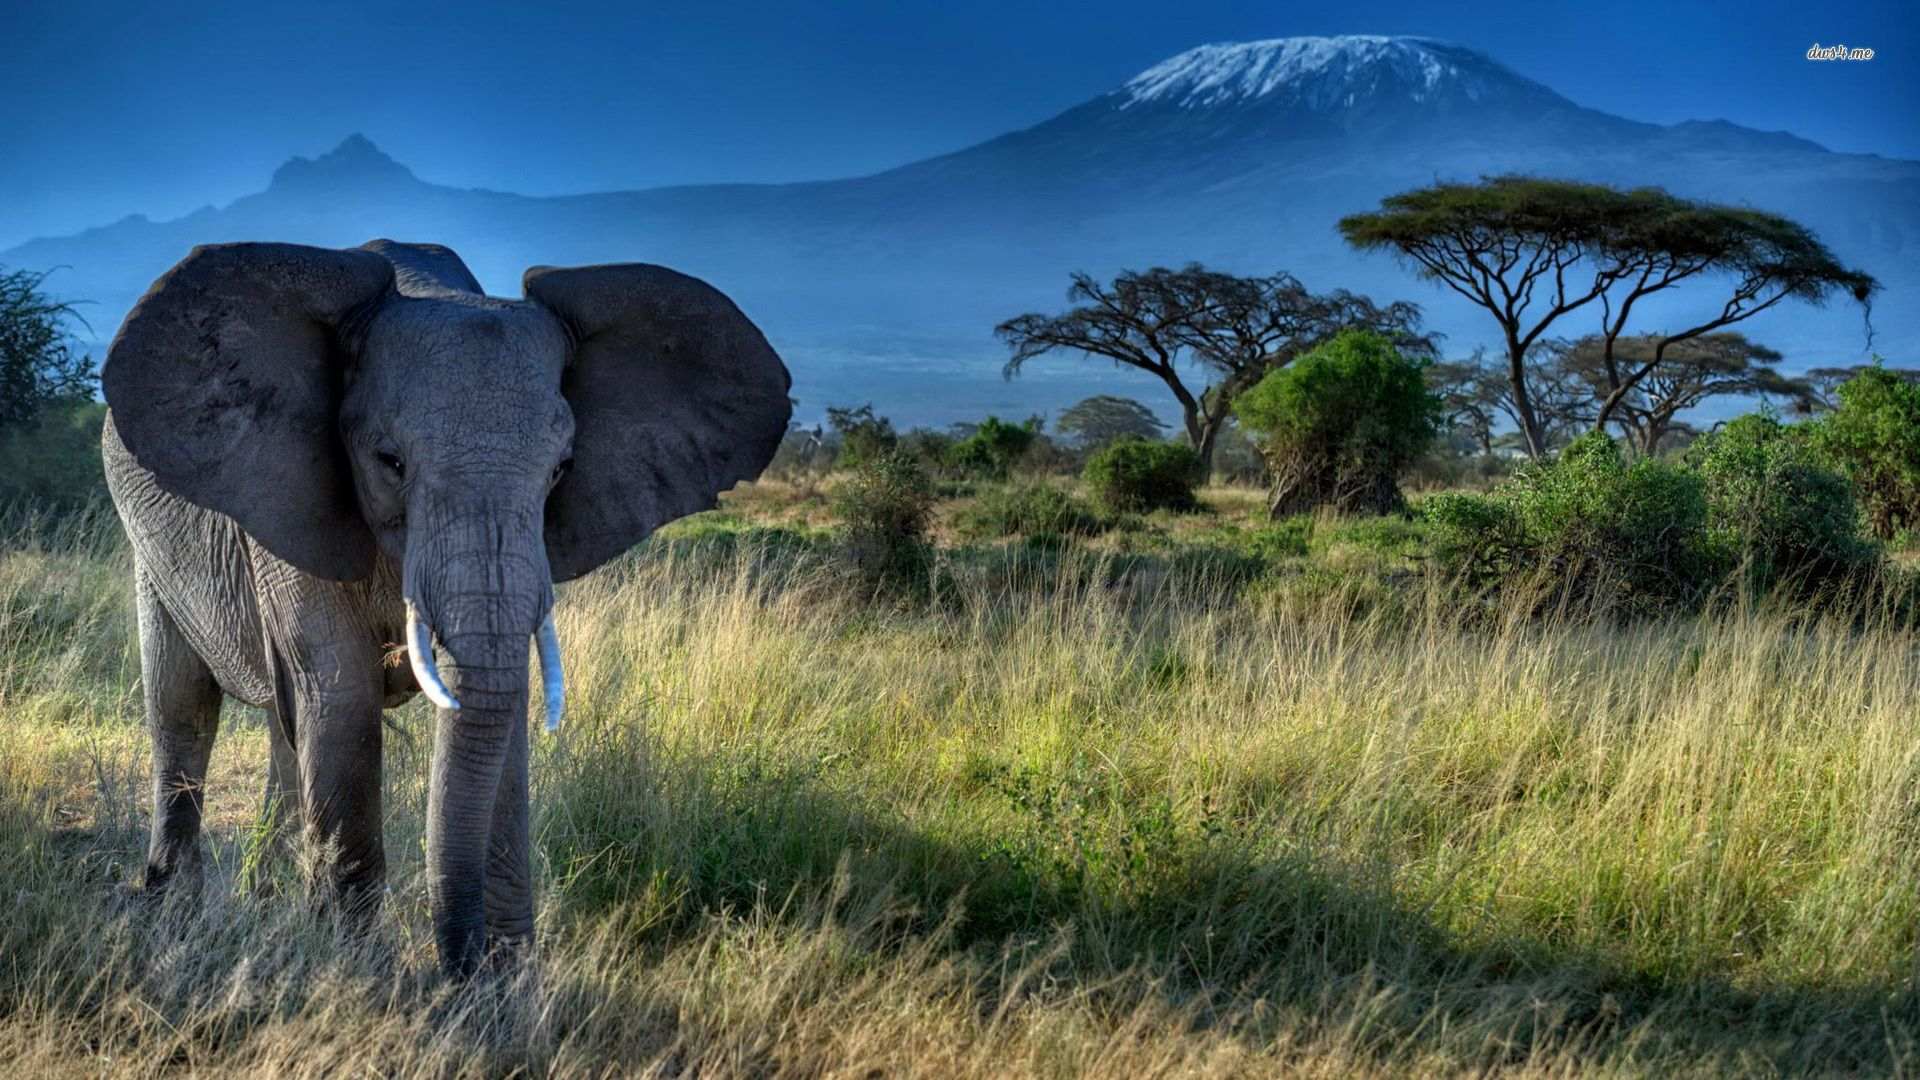 Wallpaper download elephant - Elephant Hd Desktop Wallpaper High Resolution Wallpaper Full Size